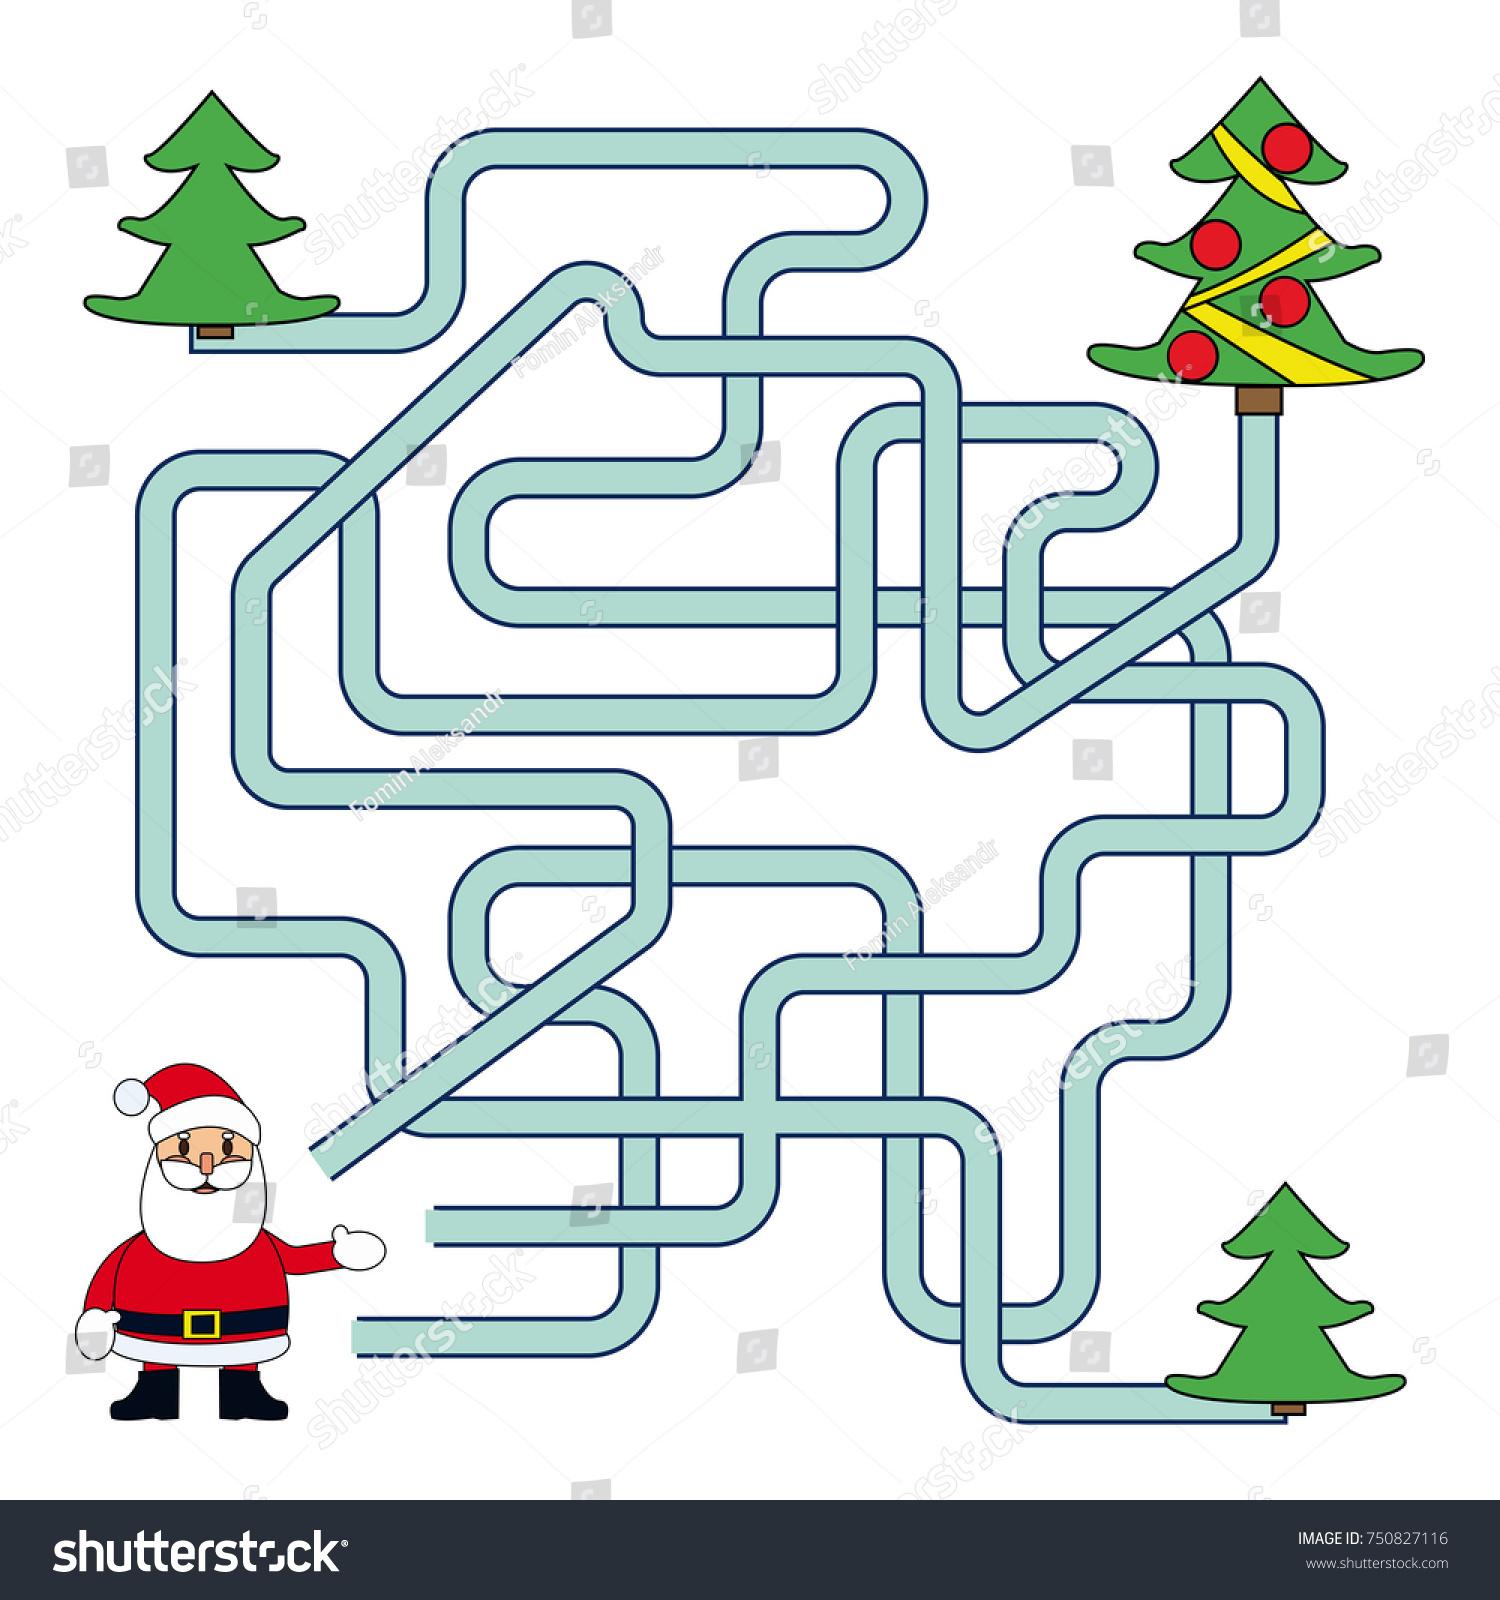 Funny Christmas Maze Game Santa Claus Stock Vector (Royalty Free ...